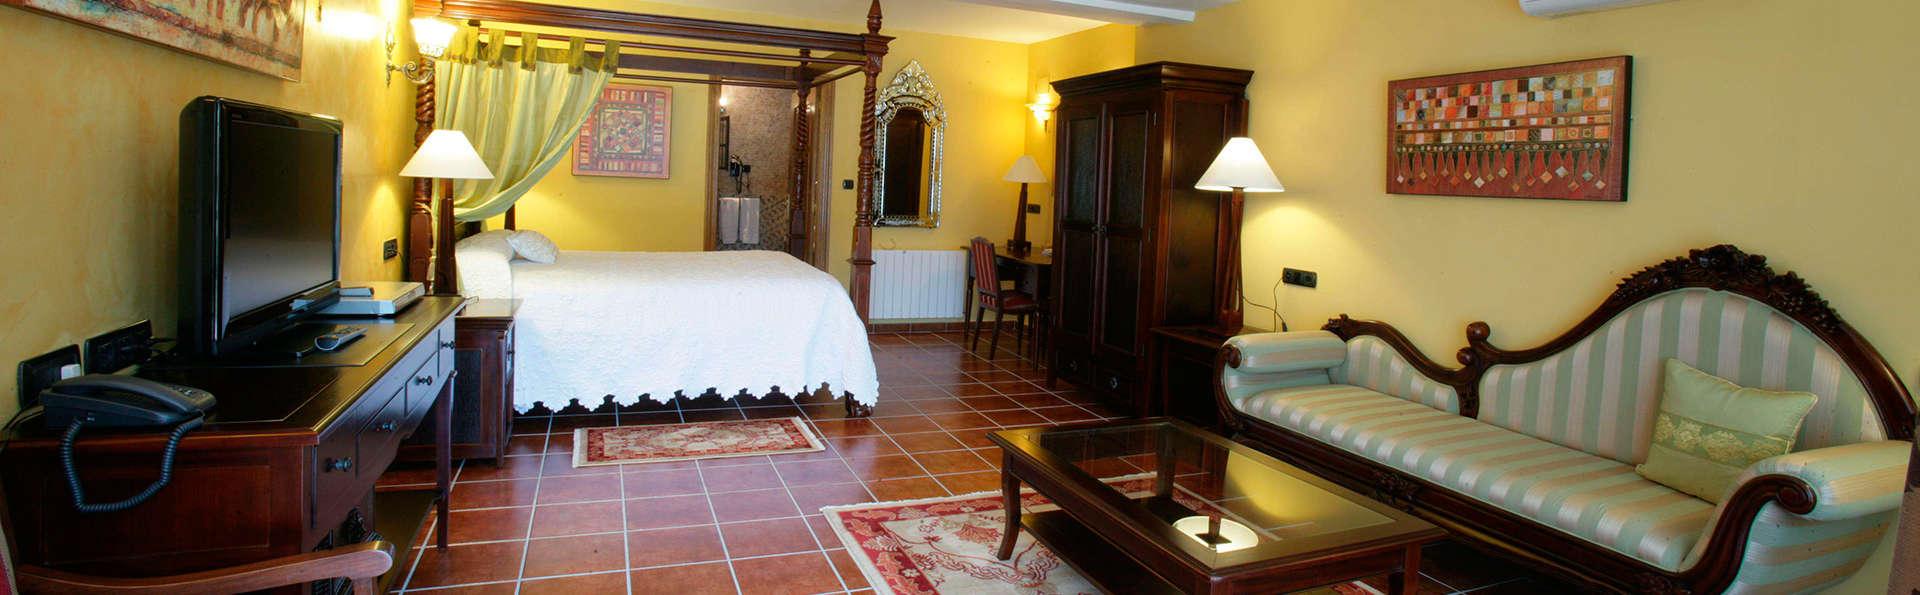 Relais du Silence Hotel & Spa Etxegana - EDIT_room3.jpg